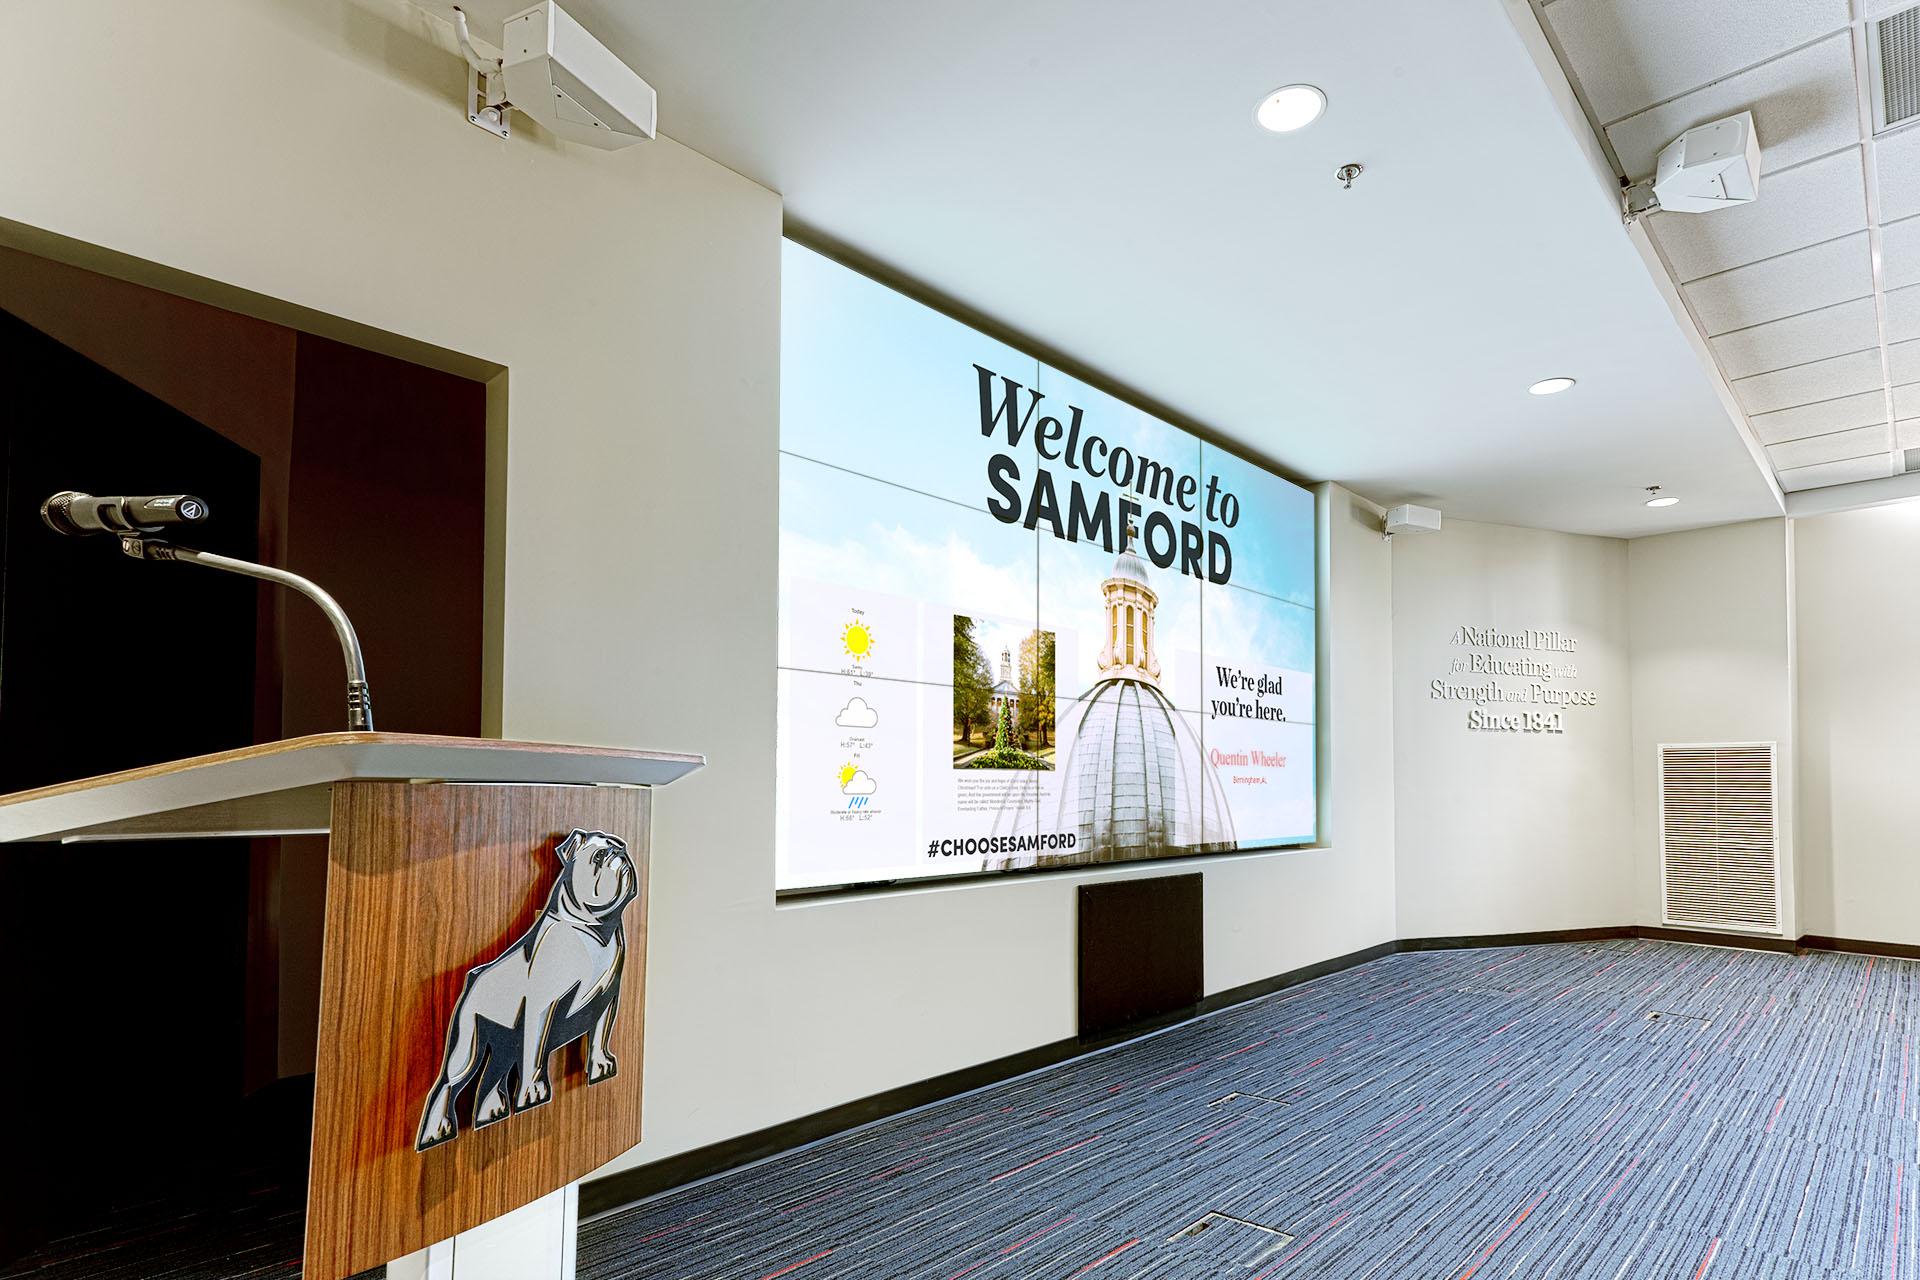 Samford Presentation Room